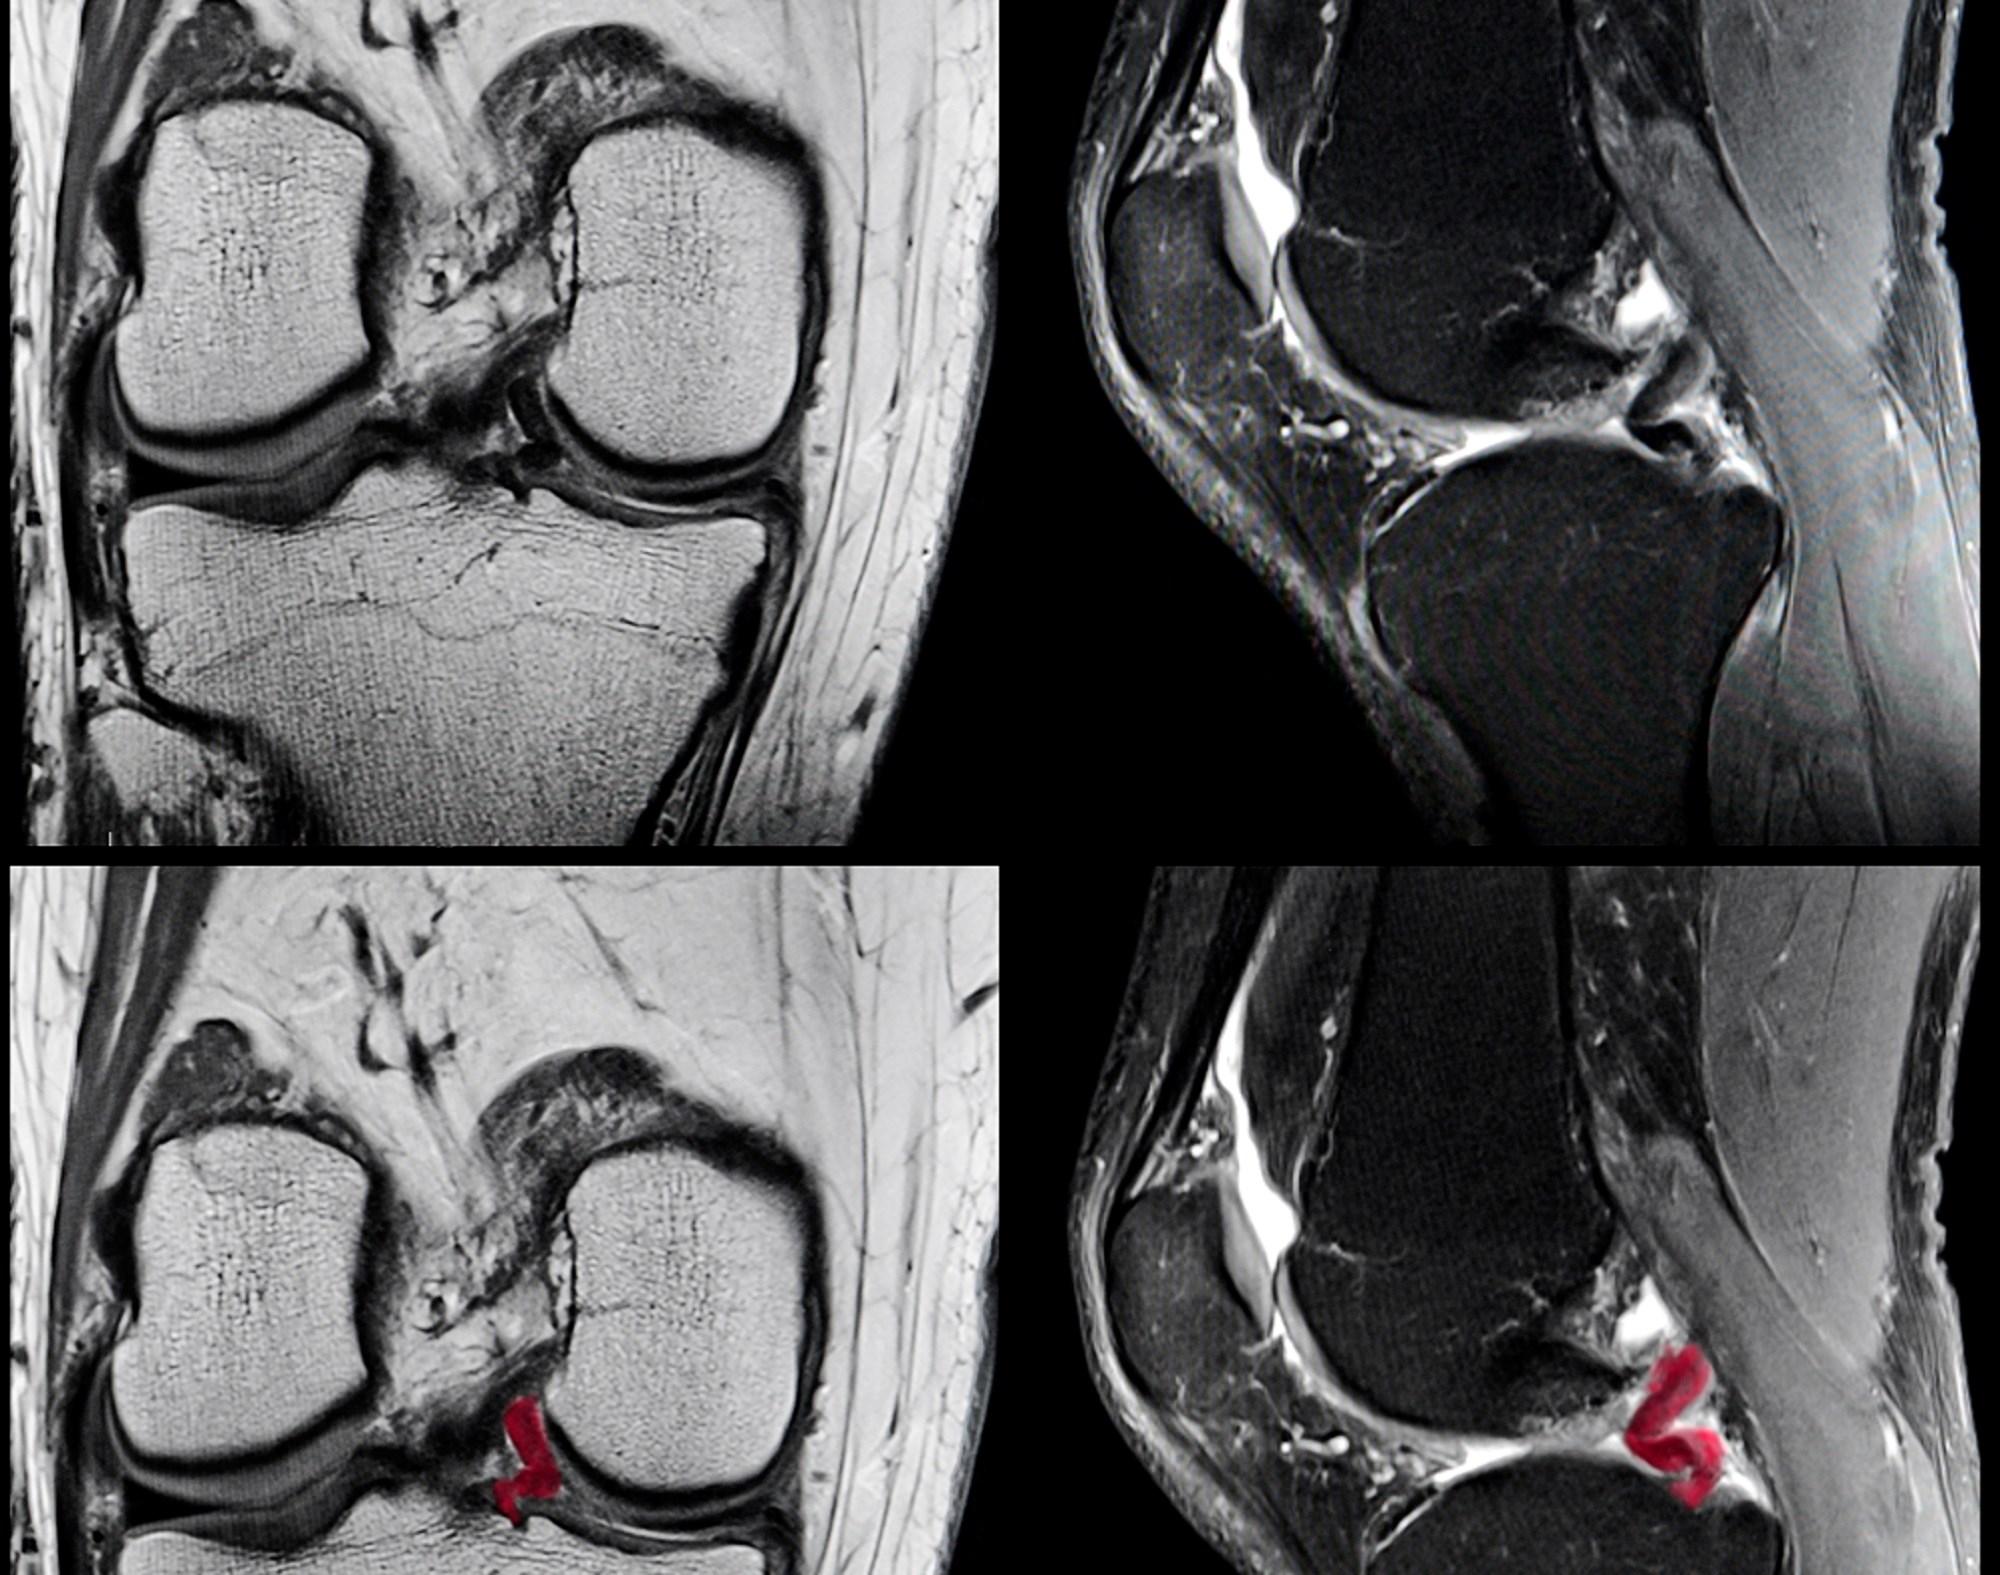 Researchers evaluated patients for destabilizing meniscal tears, miscellaneous pathology, meniscal damage, bone marrow lesions, and damage to cartilage.